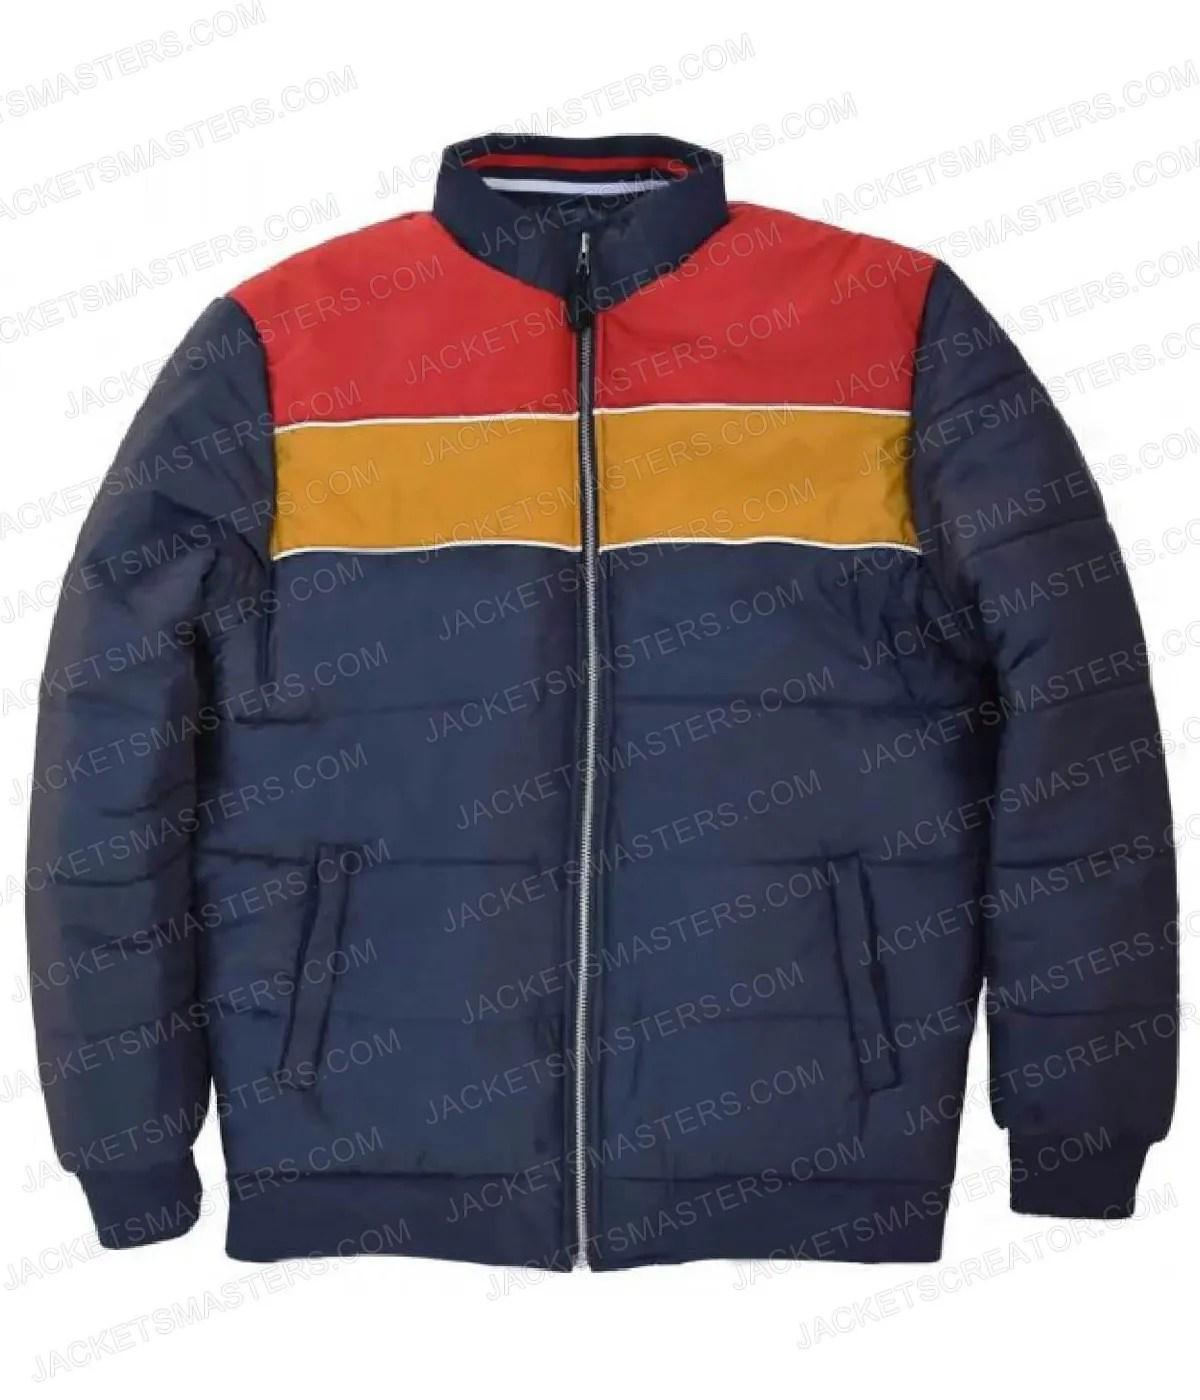 connor-jessup-locke-key-puffer-jacket